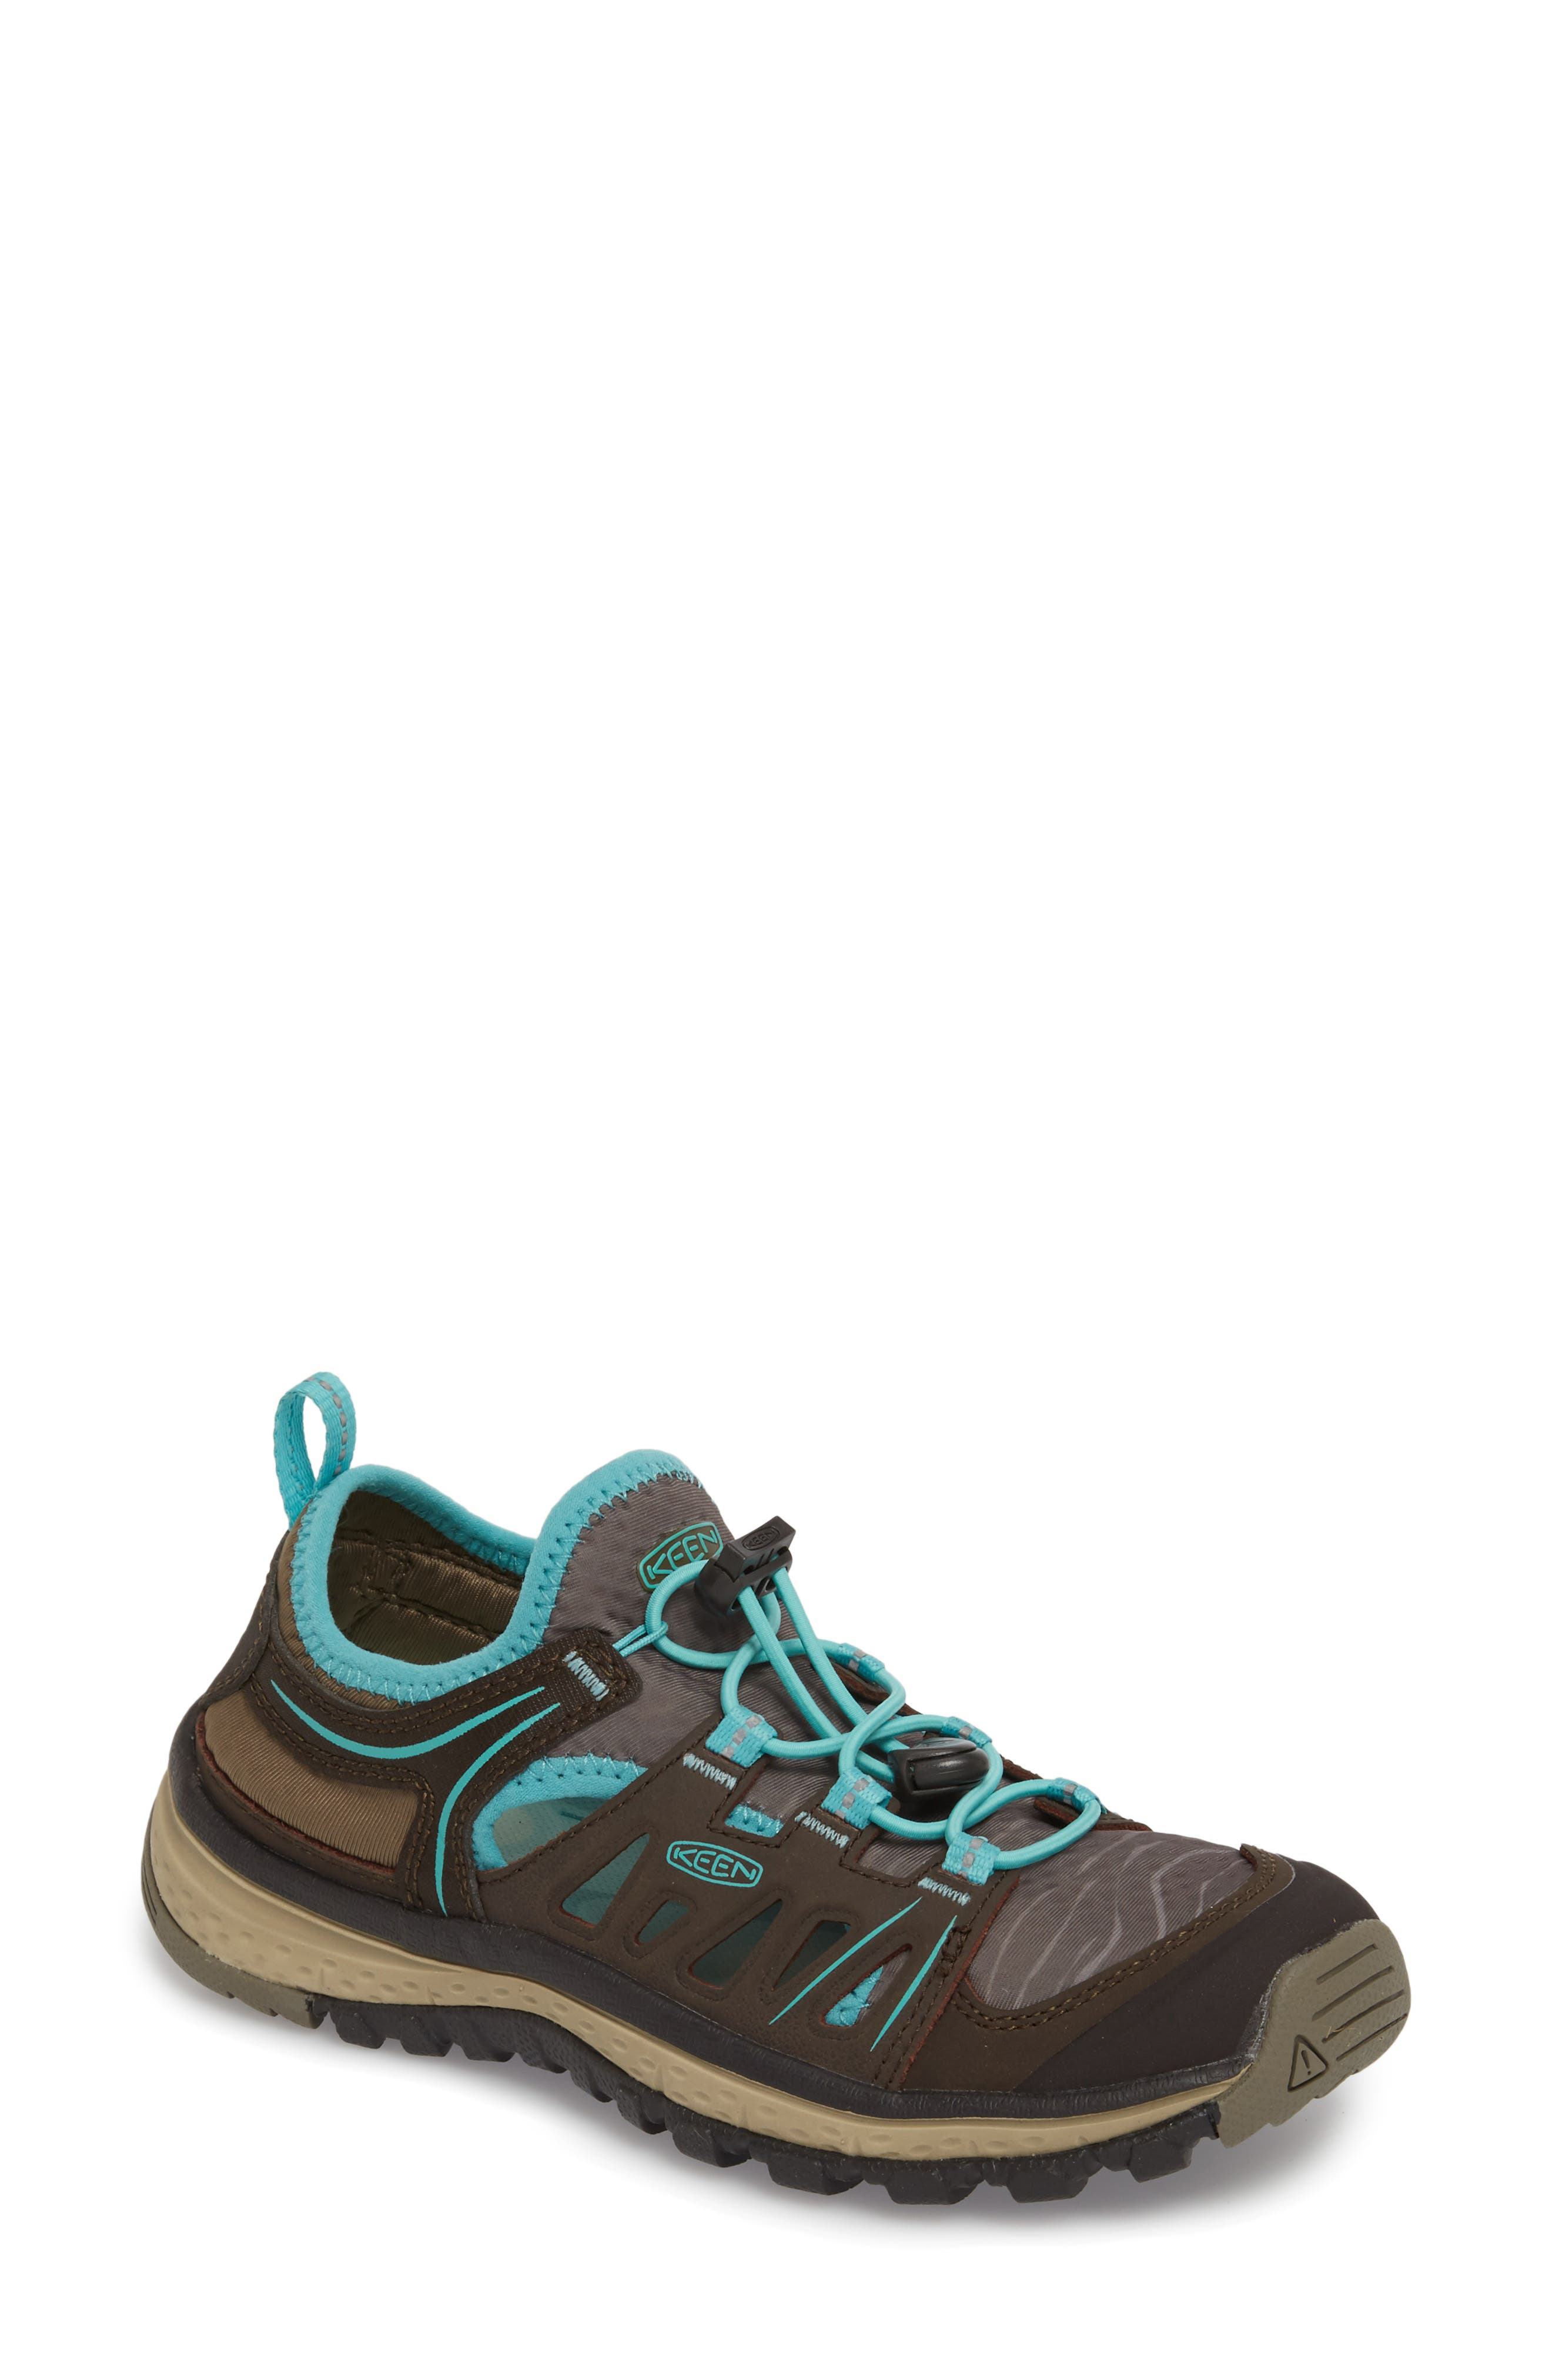 Alternate Image 1 Selected - Keen Terradora Ethos Hiking Sneaker (Women)